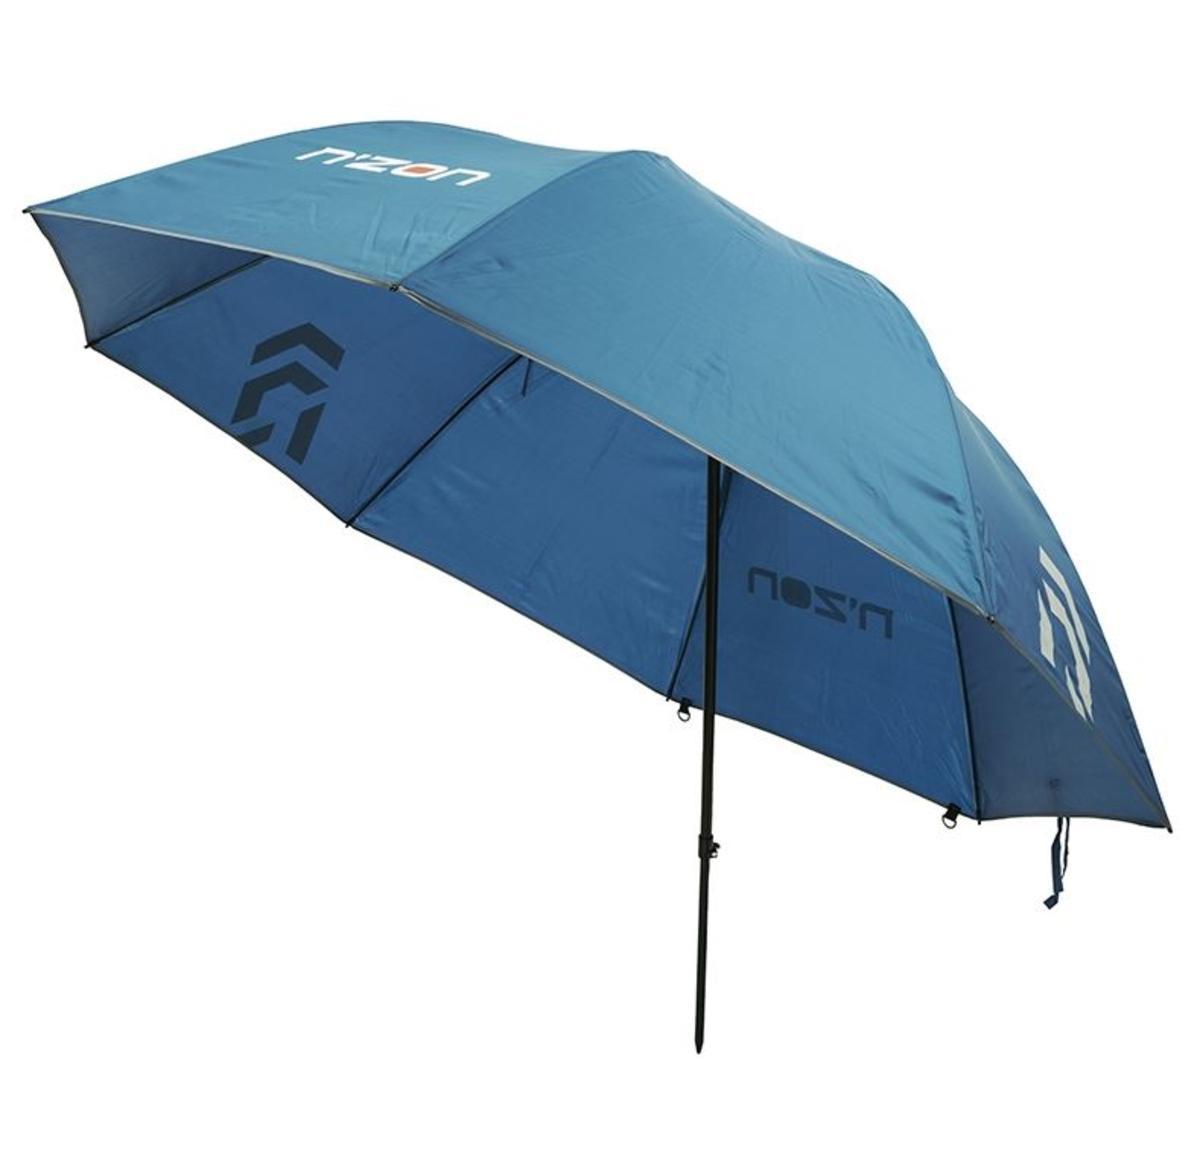 "New Daiwa N'ZON 125cm / 50"" Fishing Brolly / Umbrella - Round - NZB125"